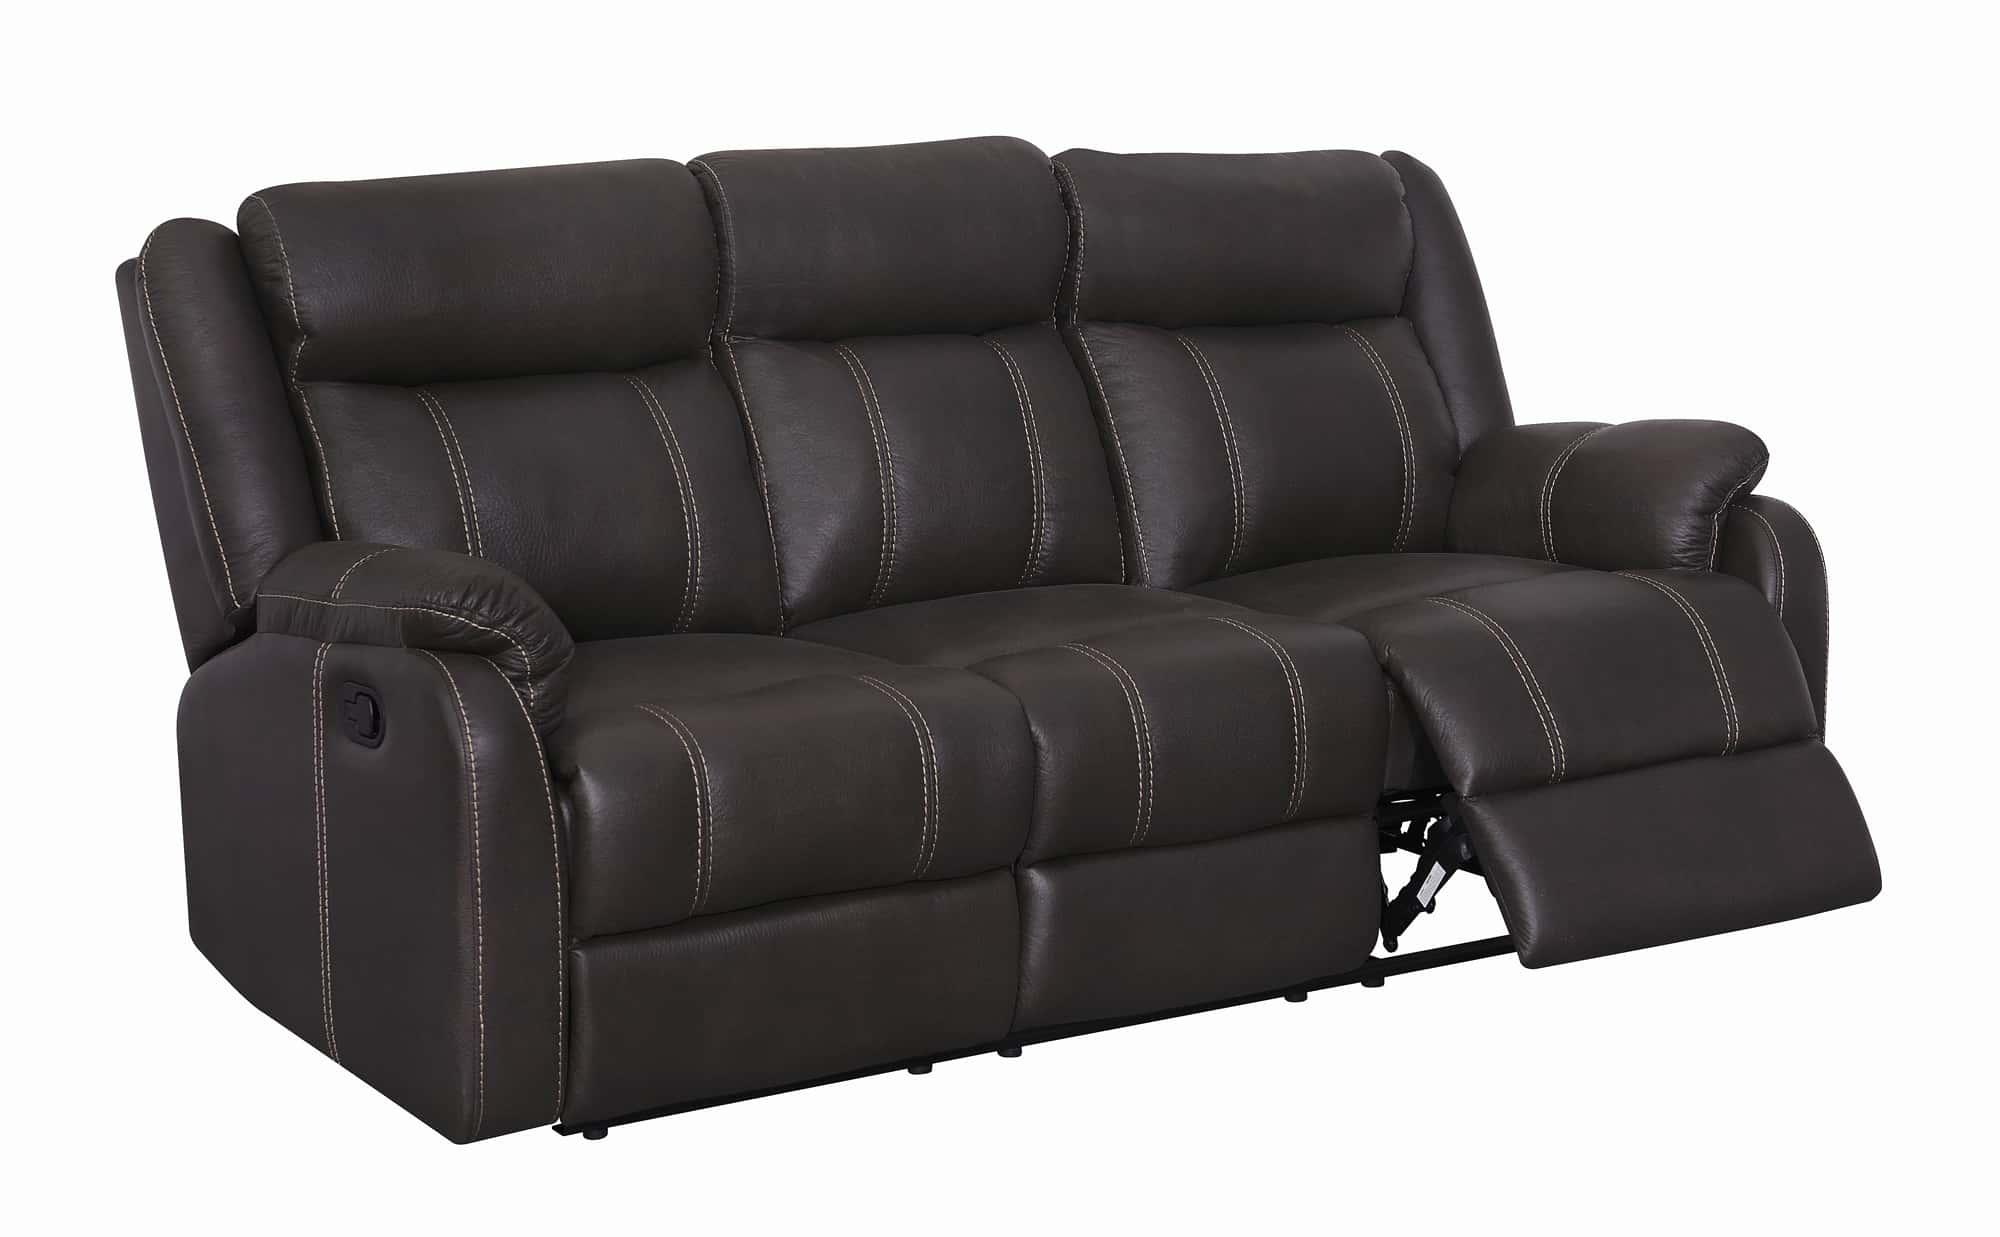 U7303c Charcoal Printed Fabric Reclining Sofa W Ddt Amp Dr